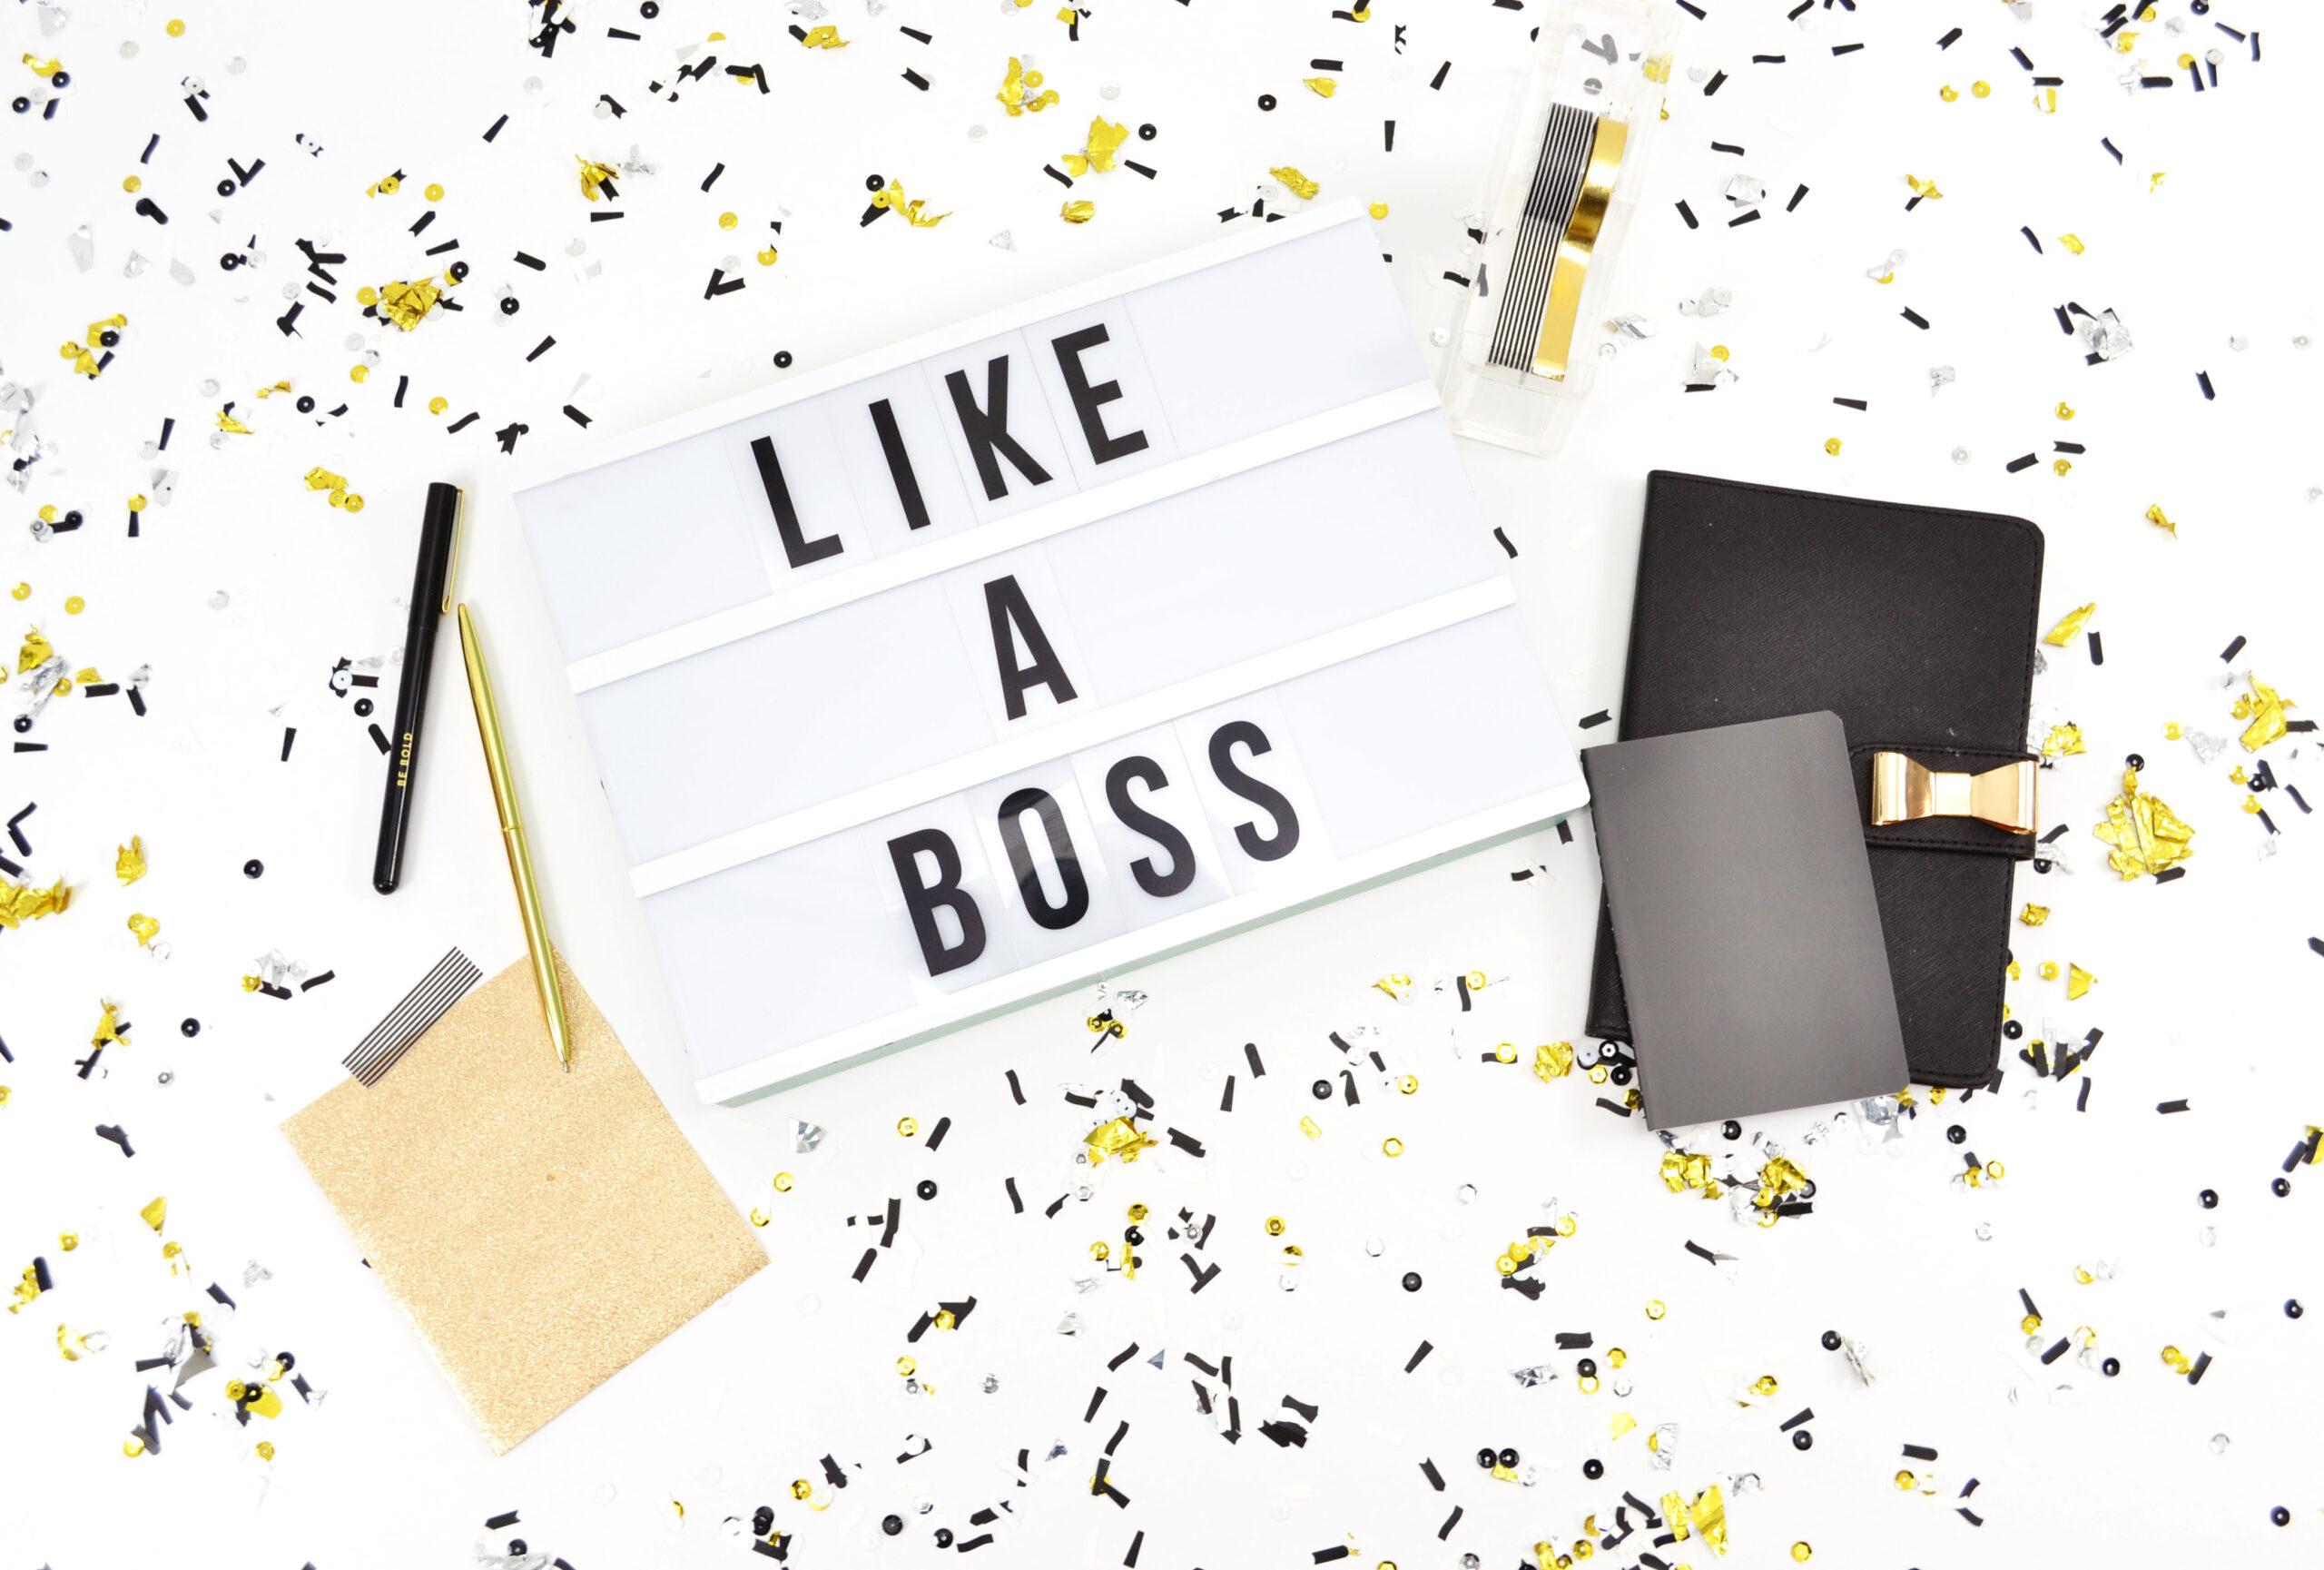 Manage A Mini-Session Like a Boss